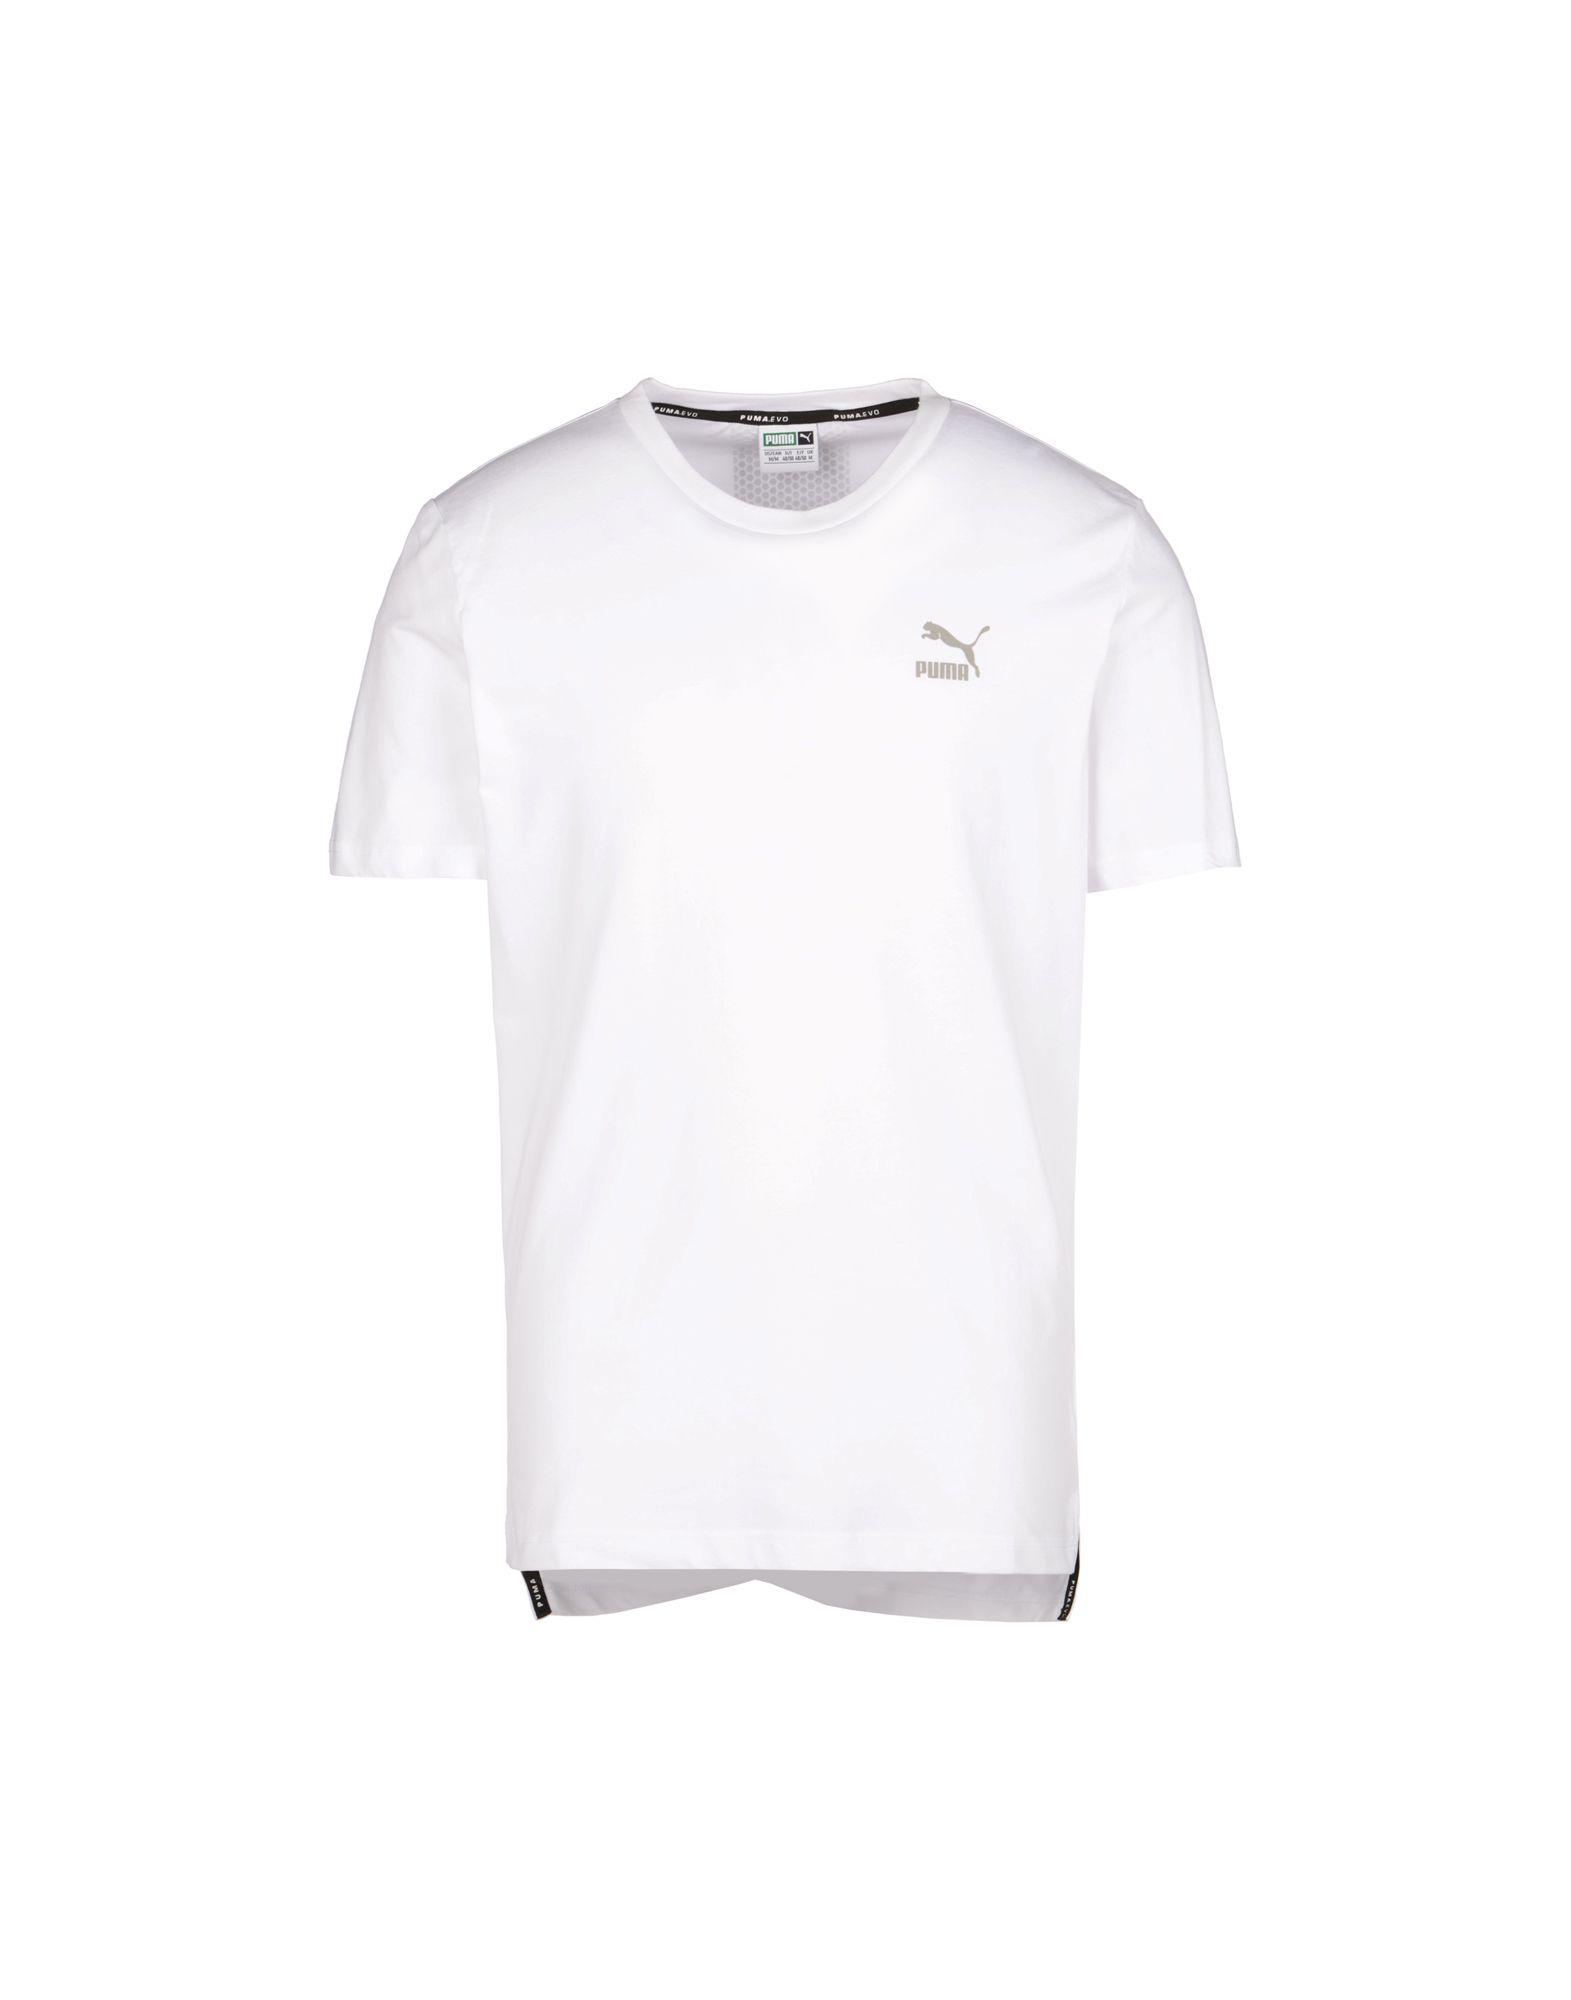 tee shirt puma blanc